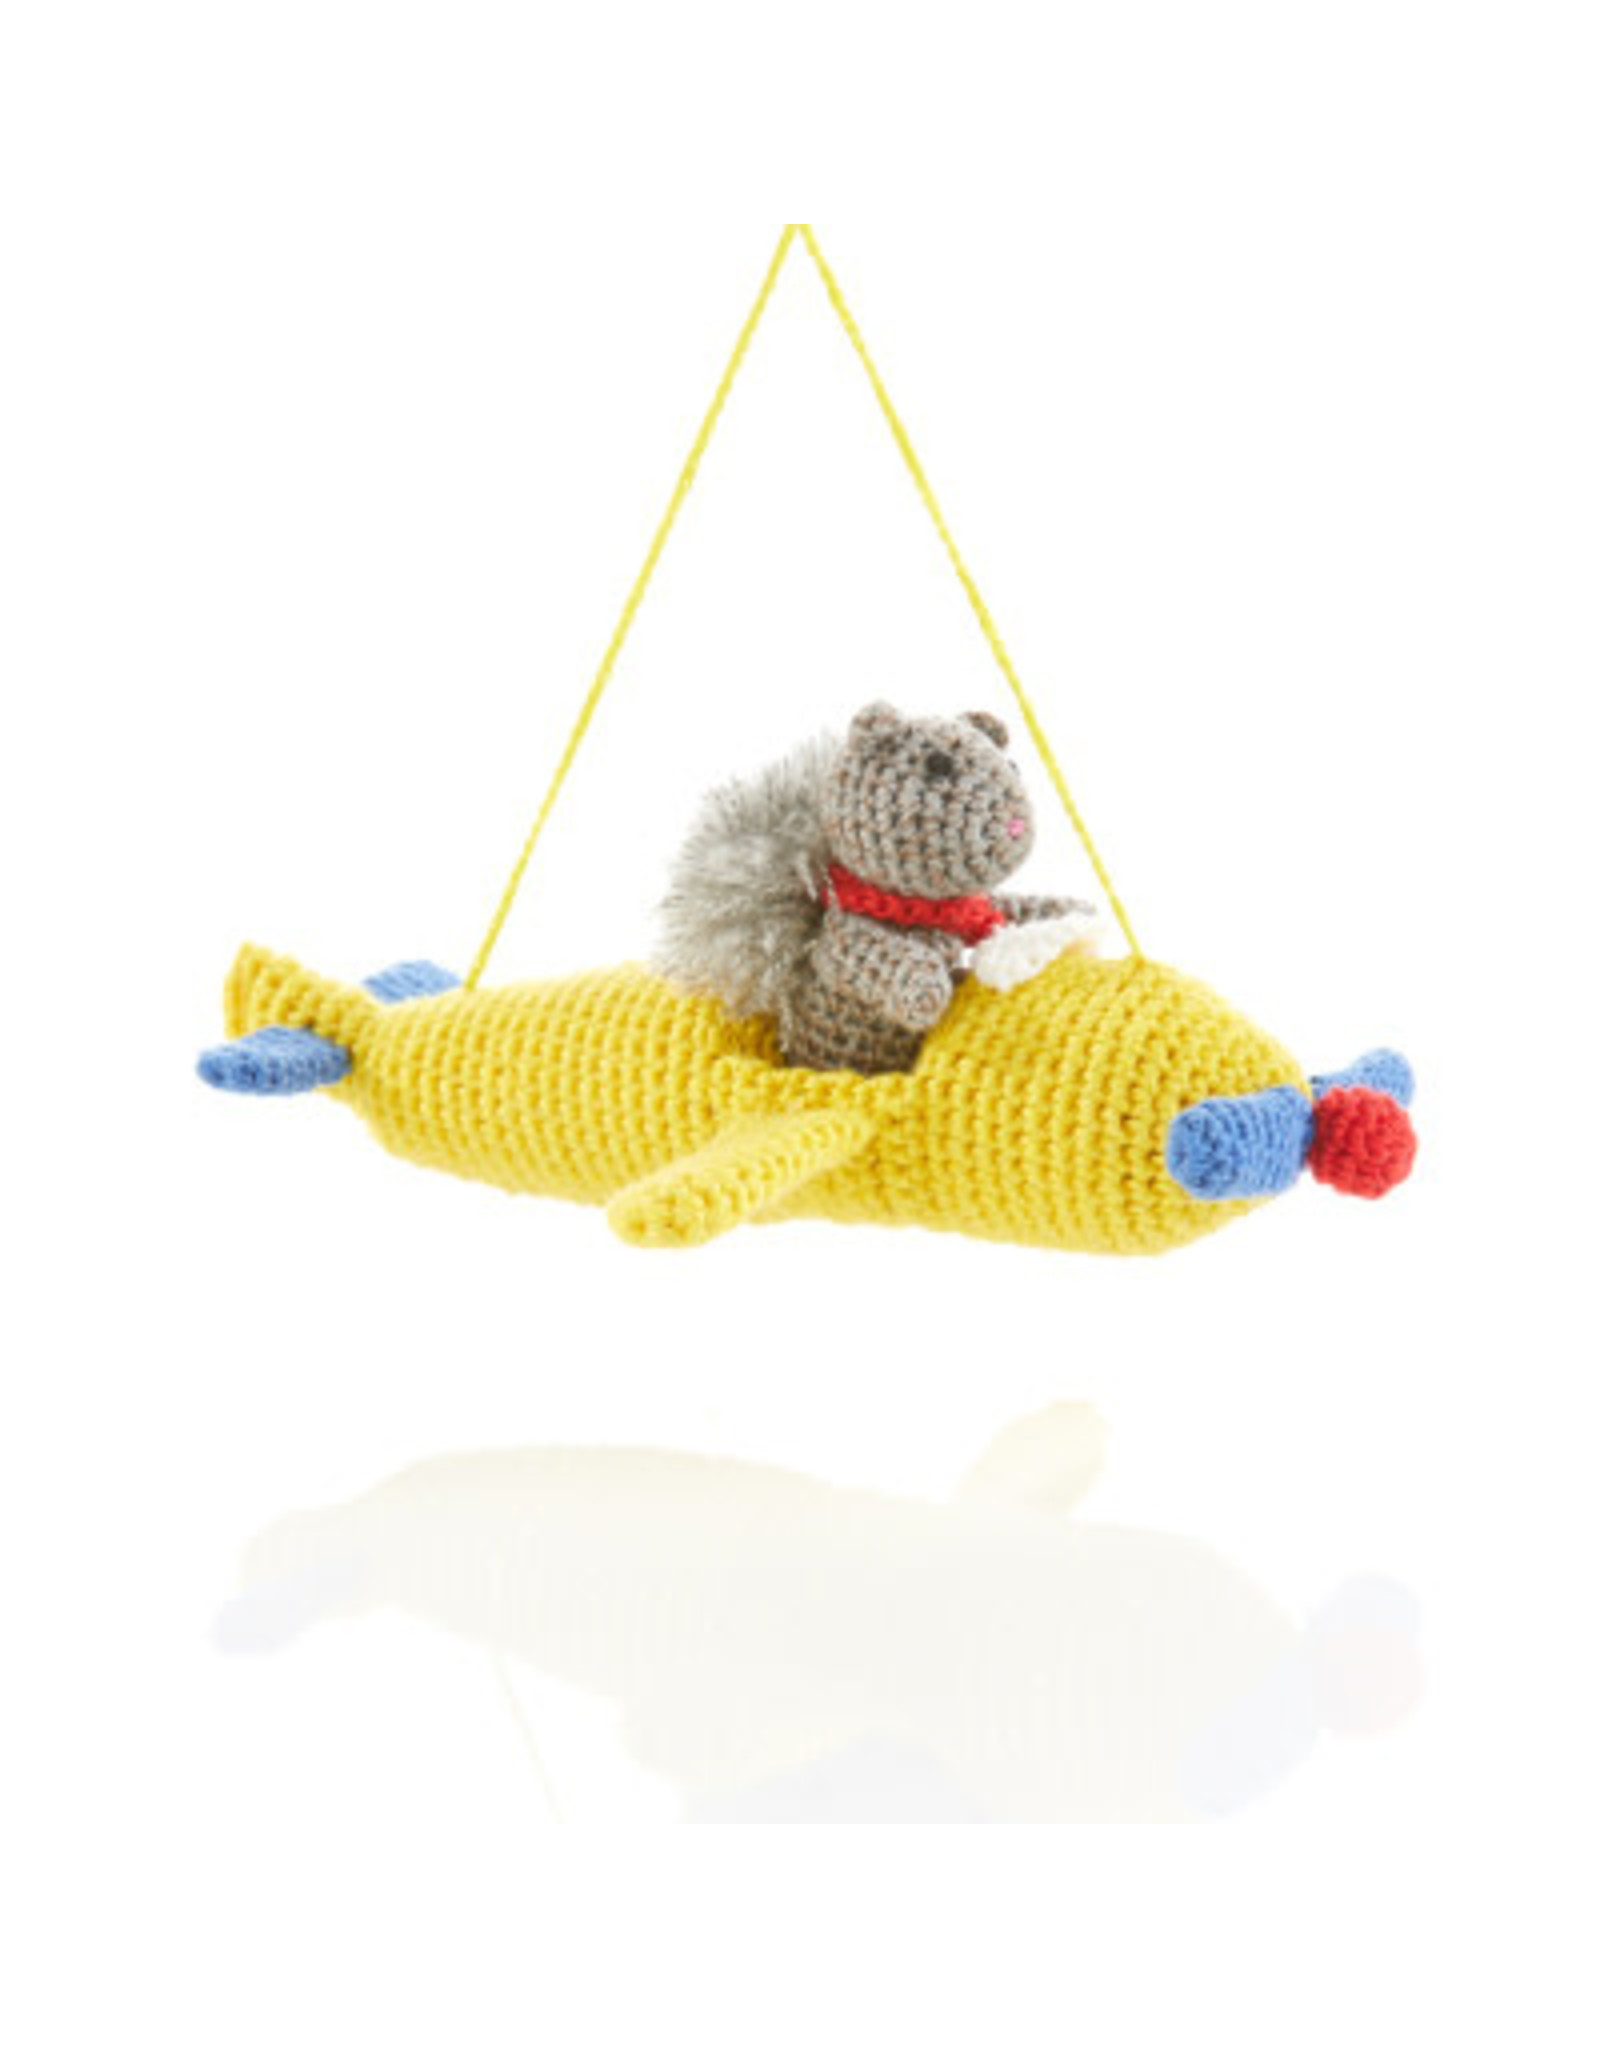 Pilot Squirrel Crocheted Ornament, Vietnam